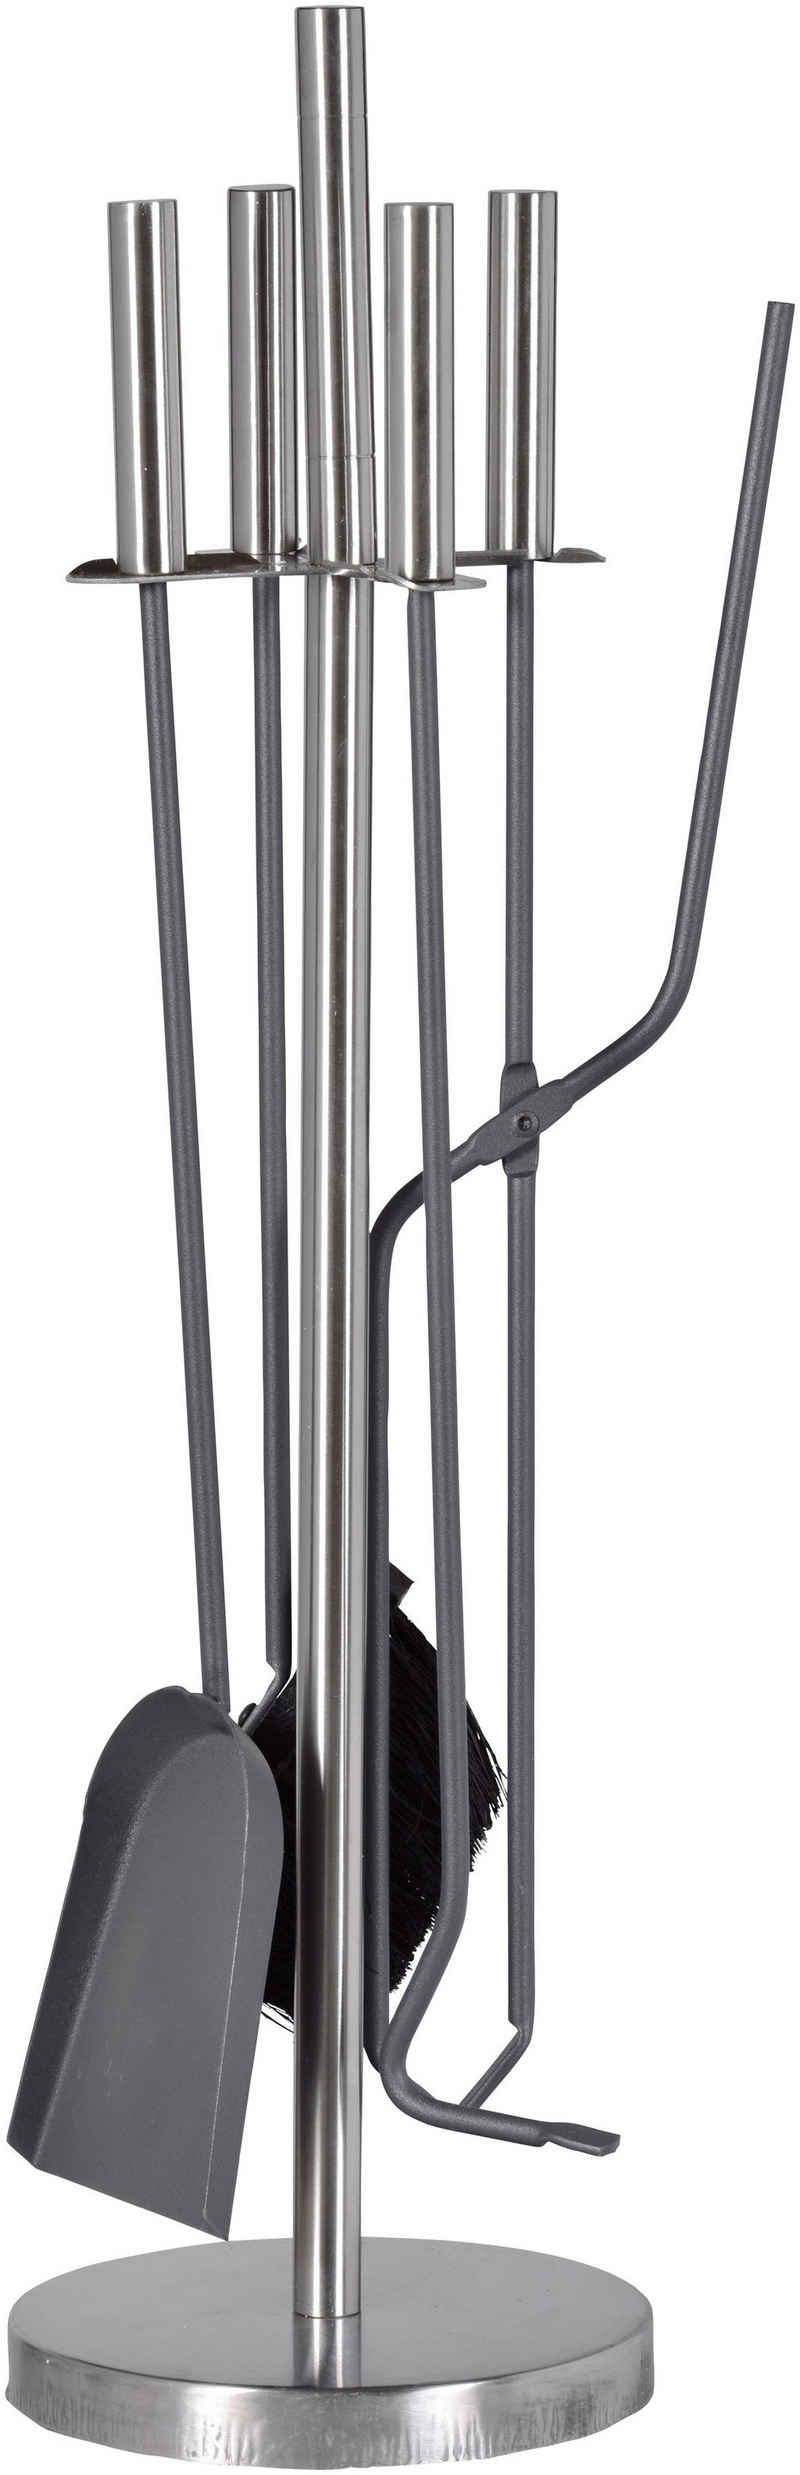 Firefix Kamingarnitur, (Set, 5-St)